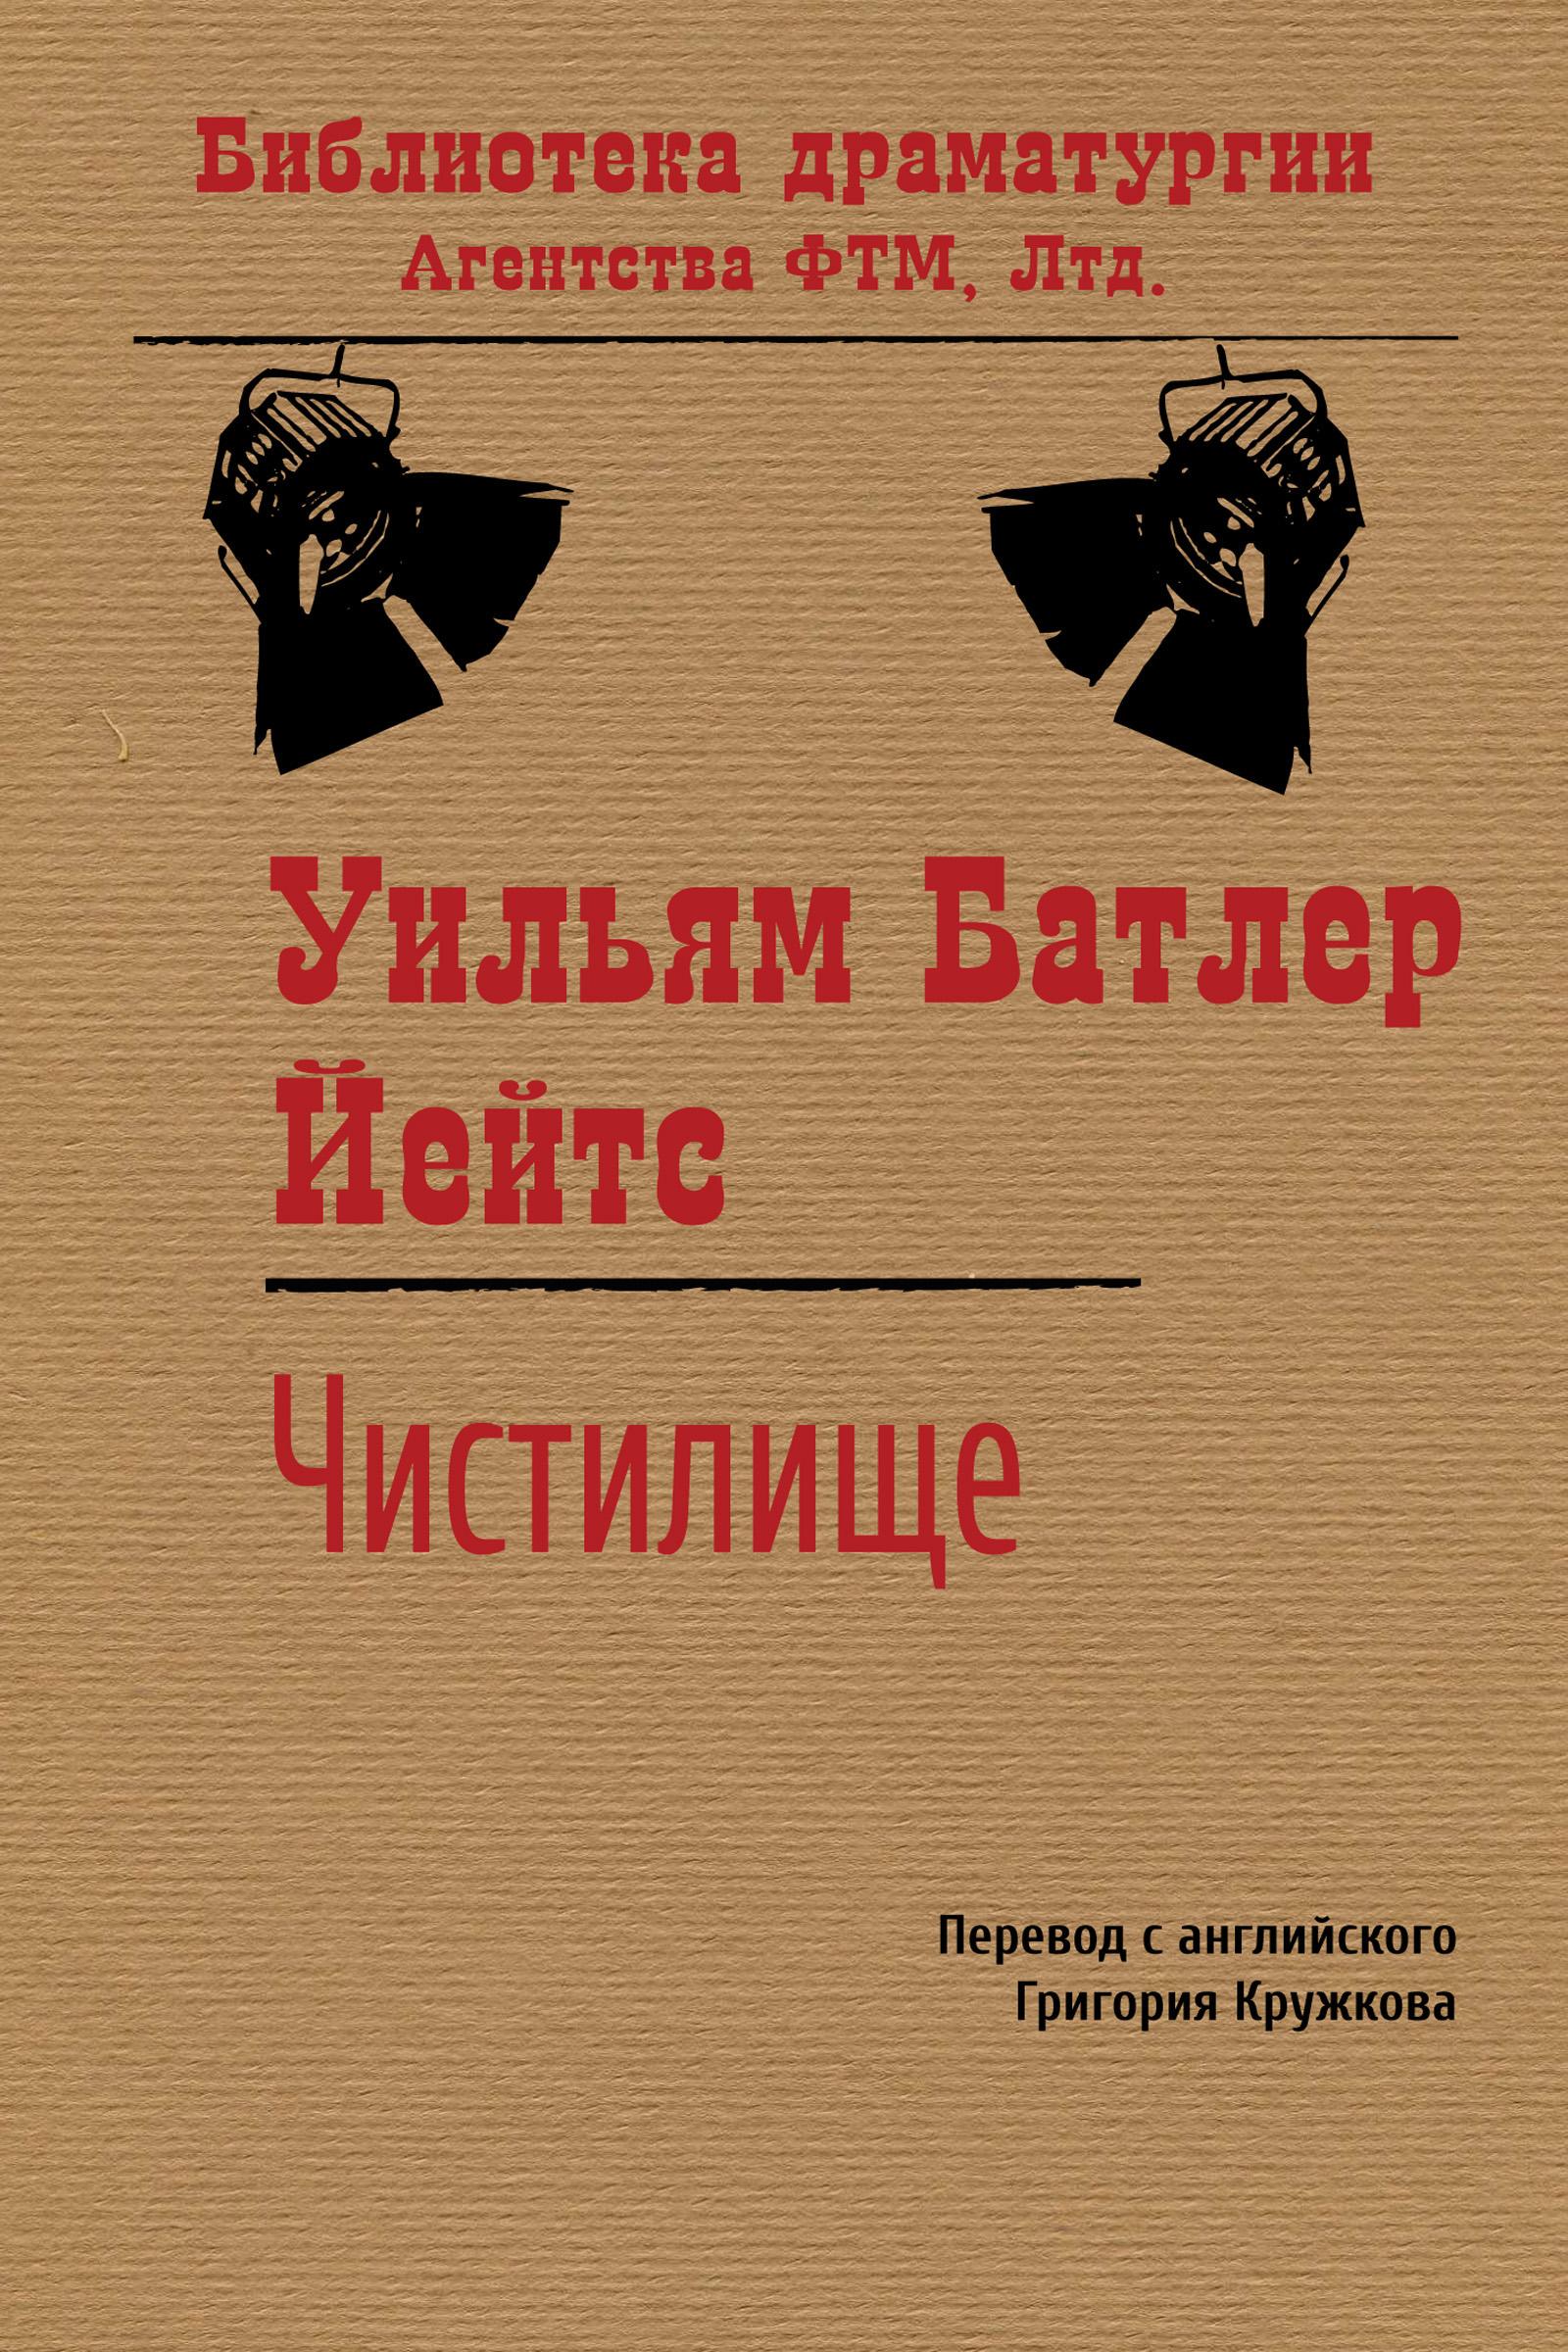 Уильям Батлер Йейтс Чистилище уильям батлер йейтс английская коллекция уильям батлер йейтс рассказы о рыжем ханрахане w в yeats stories of red hanrahan